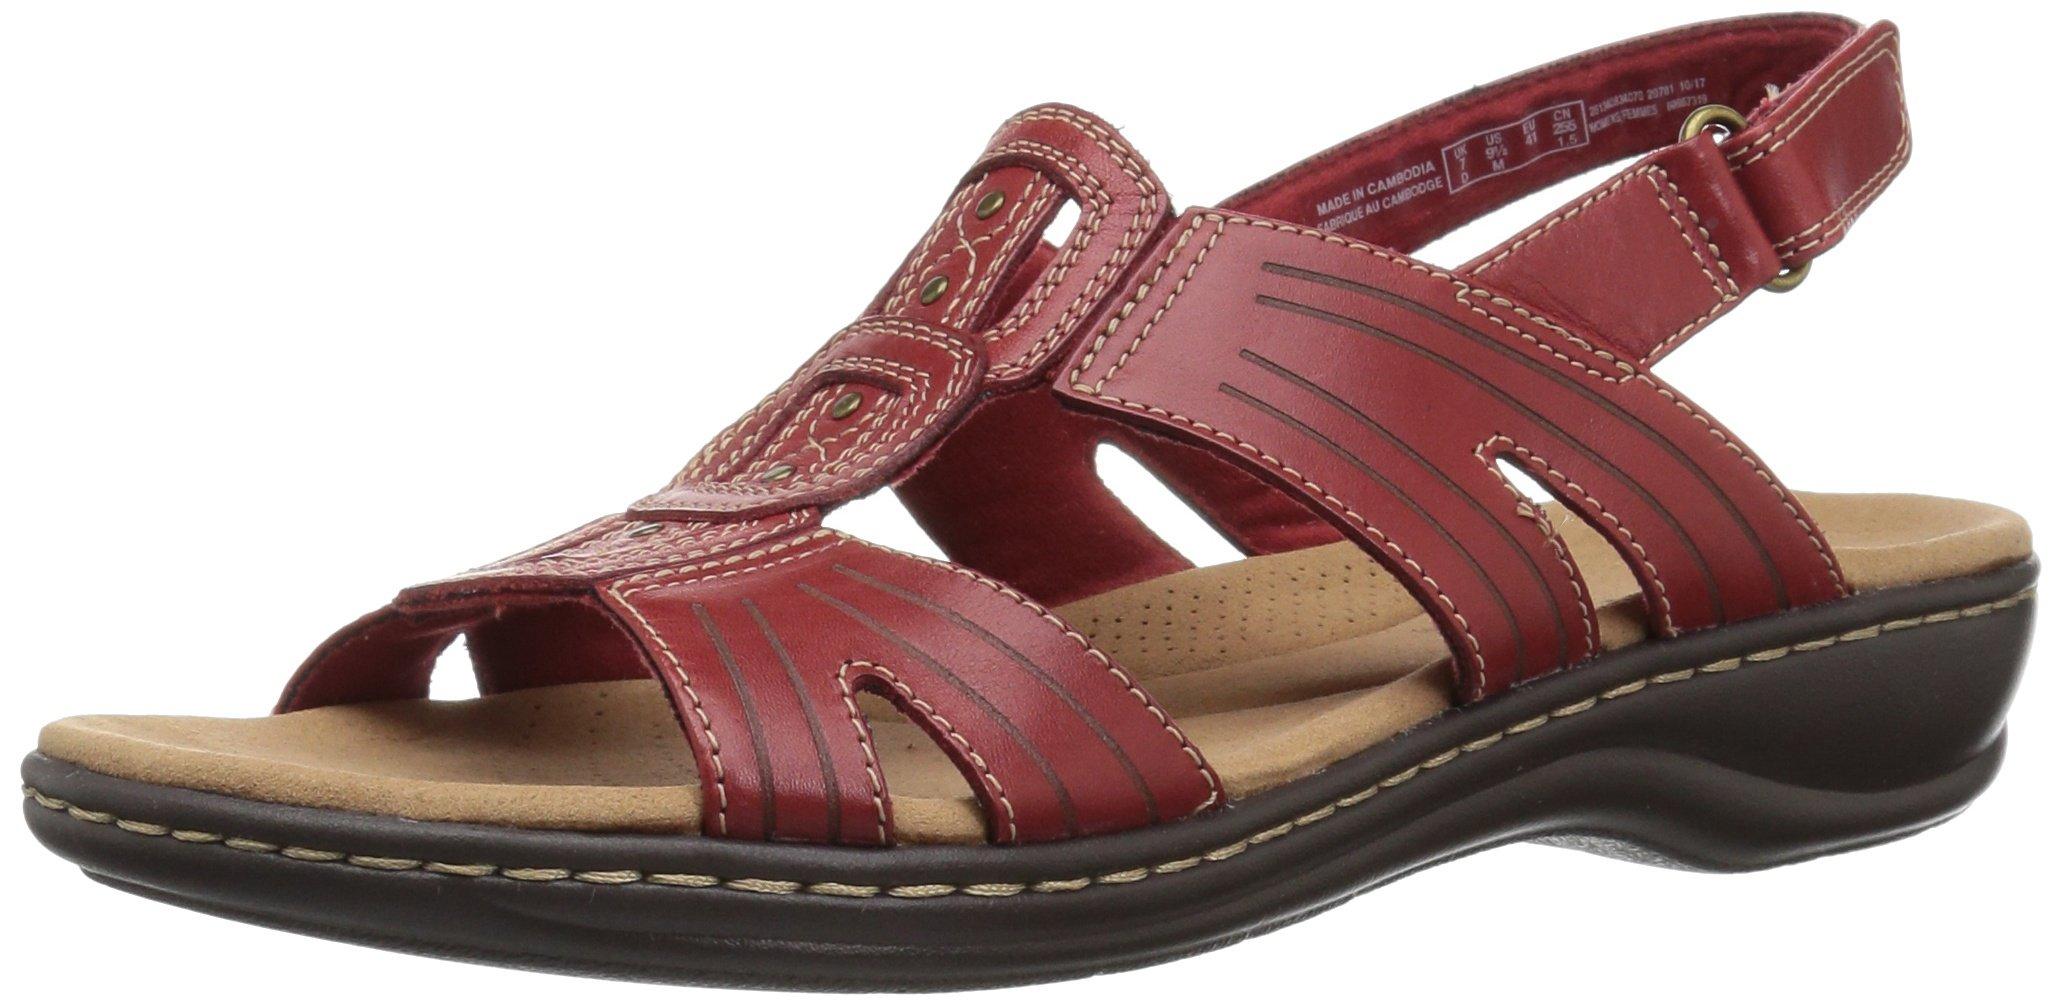 CLARKS Women's Leisa Vine Platform red Leather 8.5 Medium US